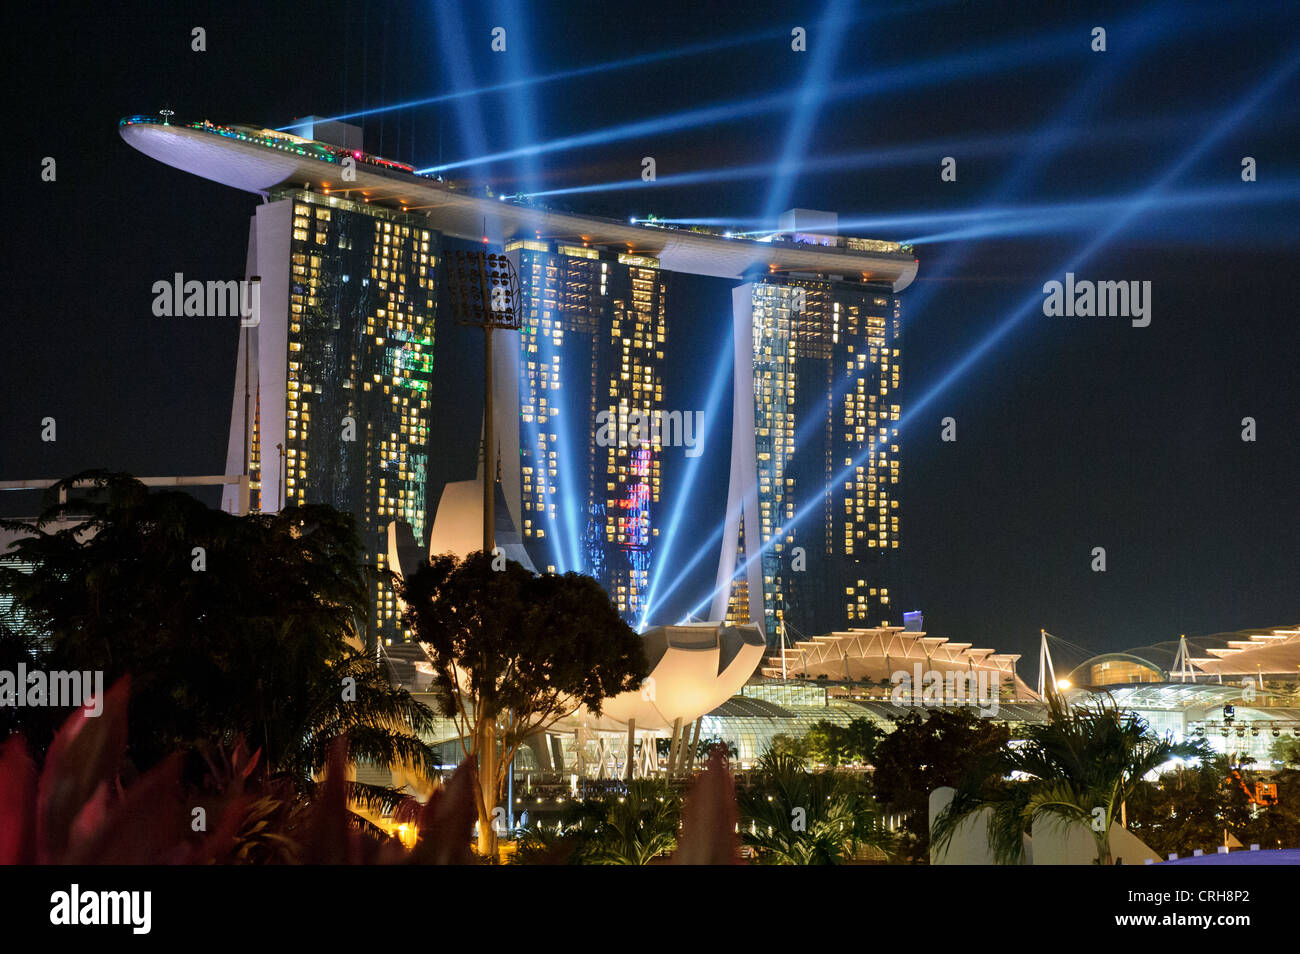 Marina Bay Sands Hotel by night, Marina Bay, Singapore. - Stock Image